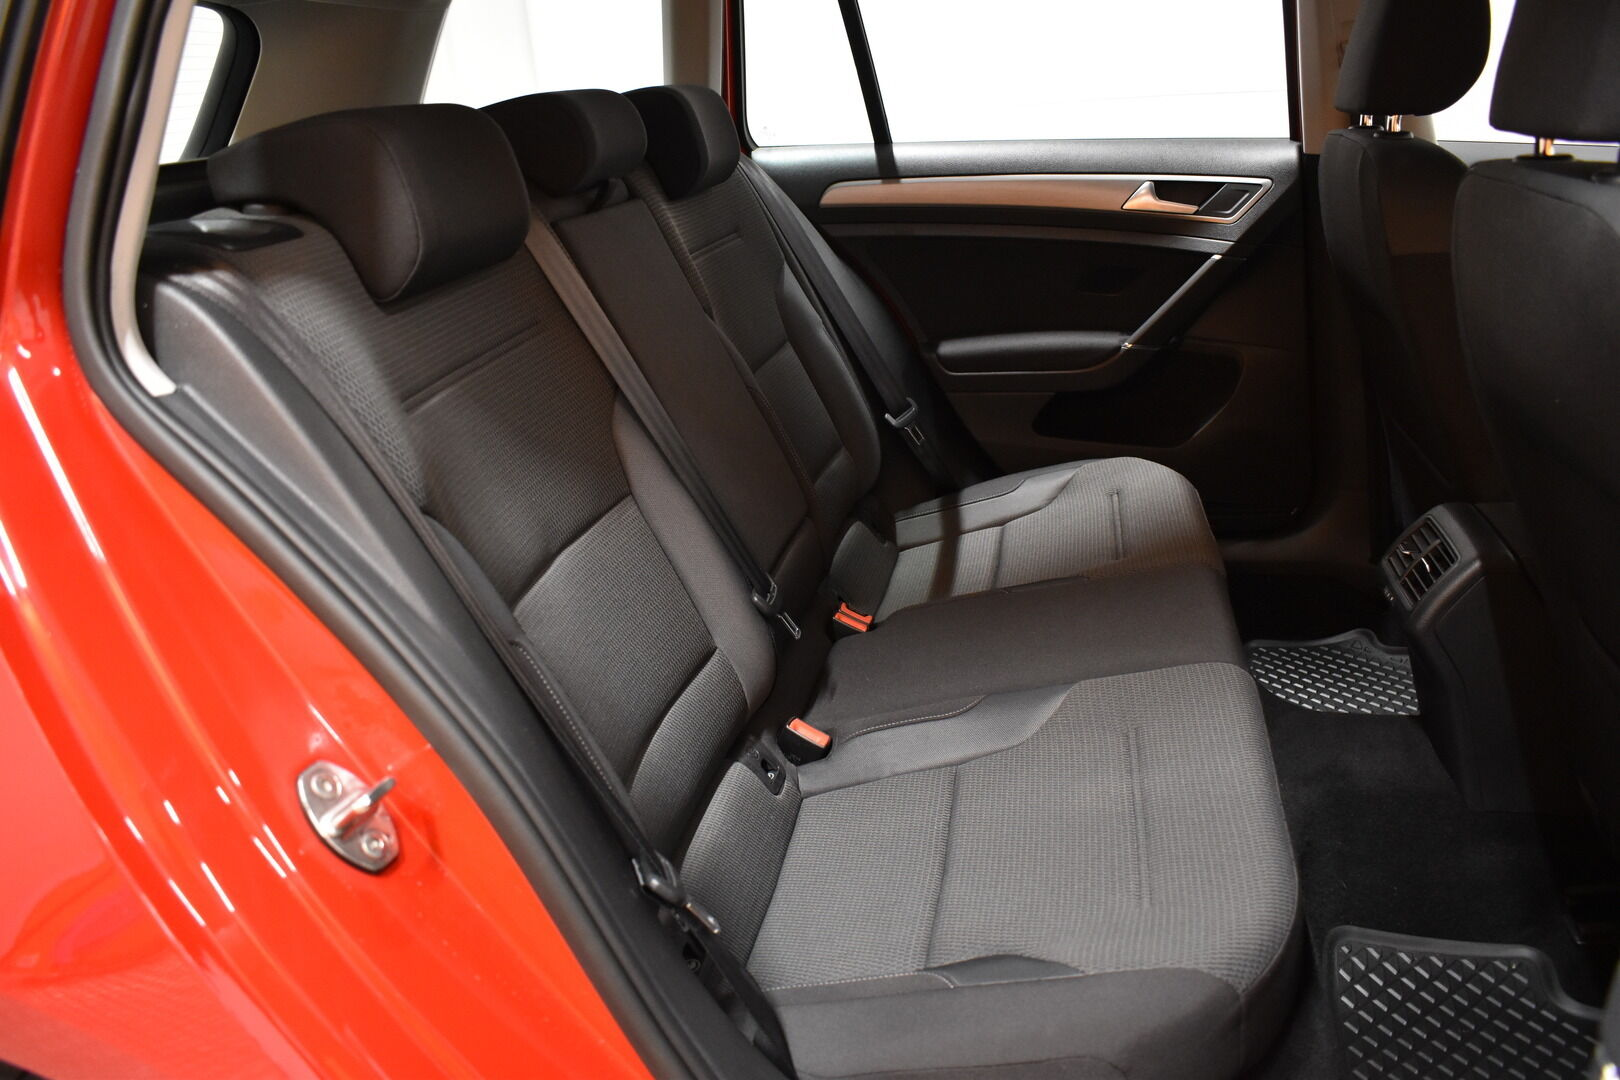 Punainen Farmari, Volkswagen Golf – LEM-79340, kuva 10